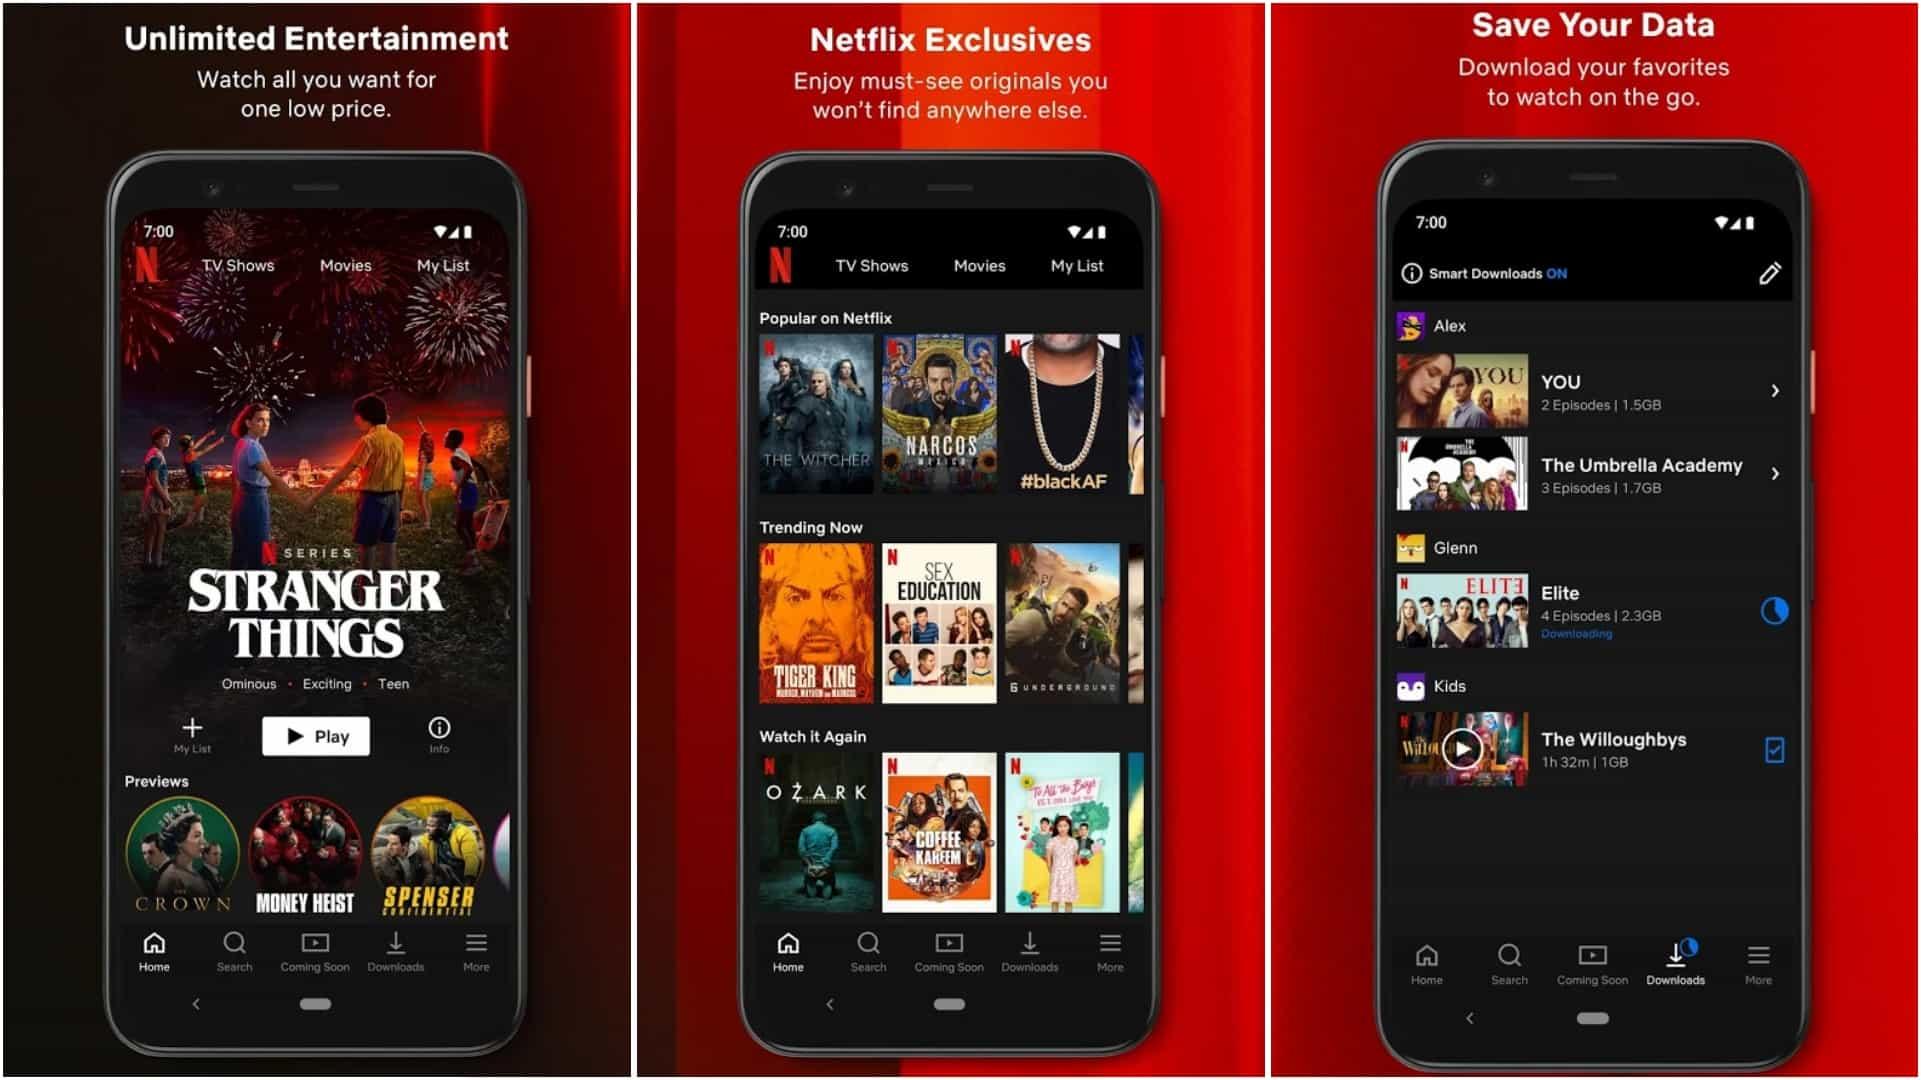 Netflix app grid